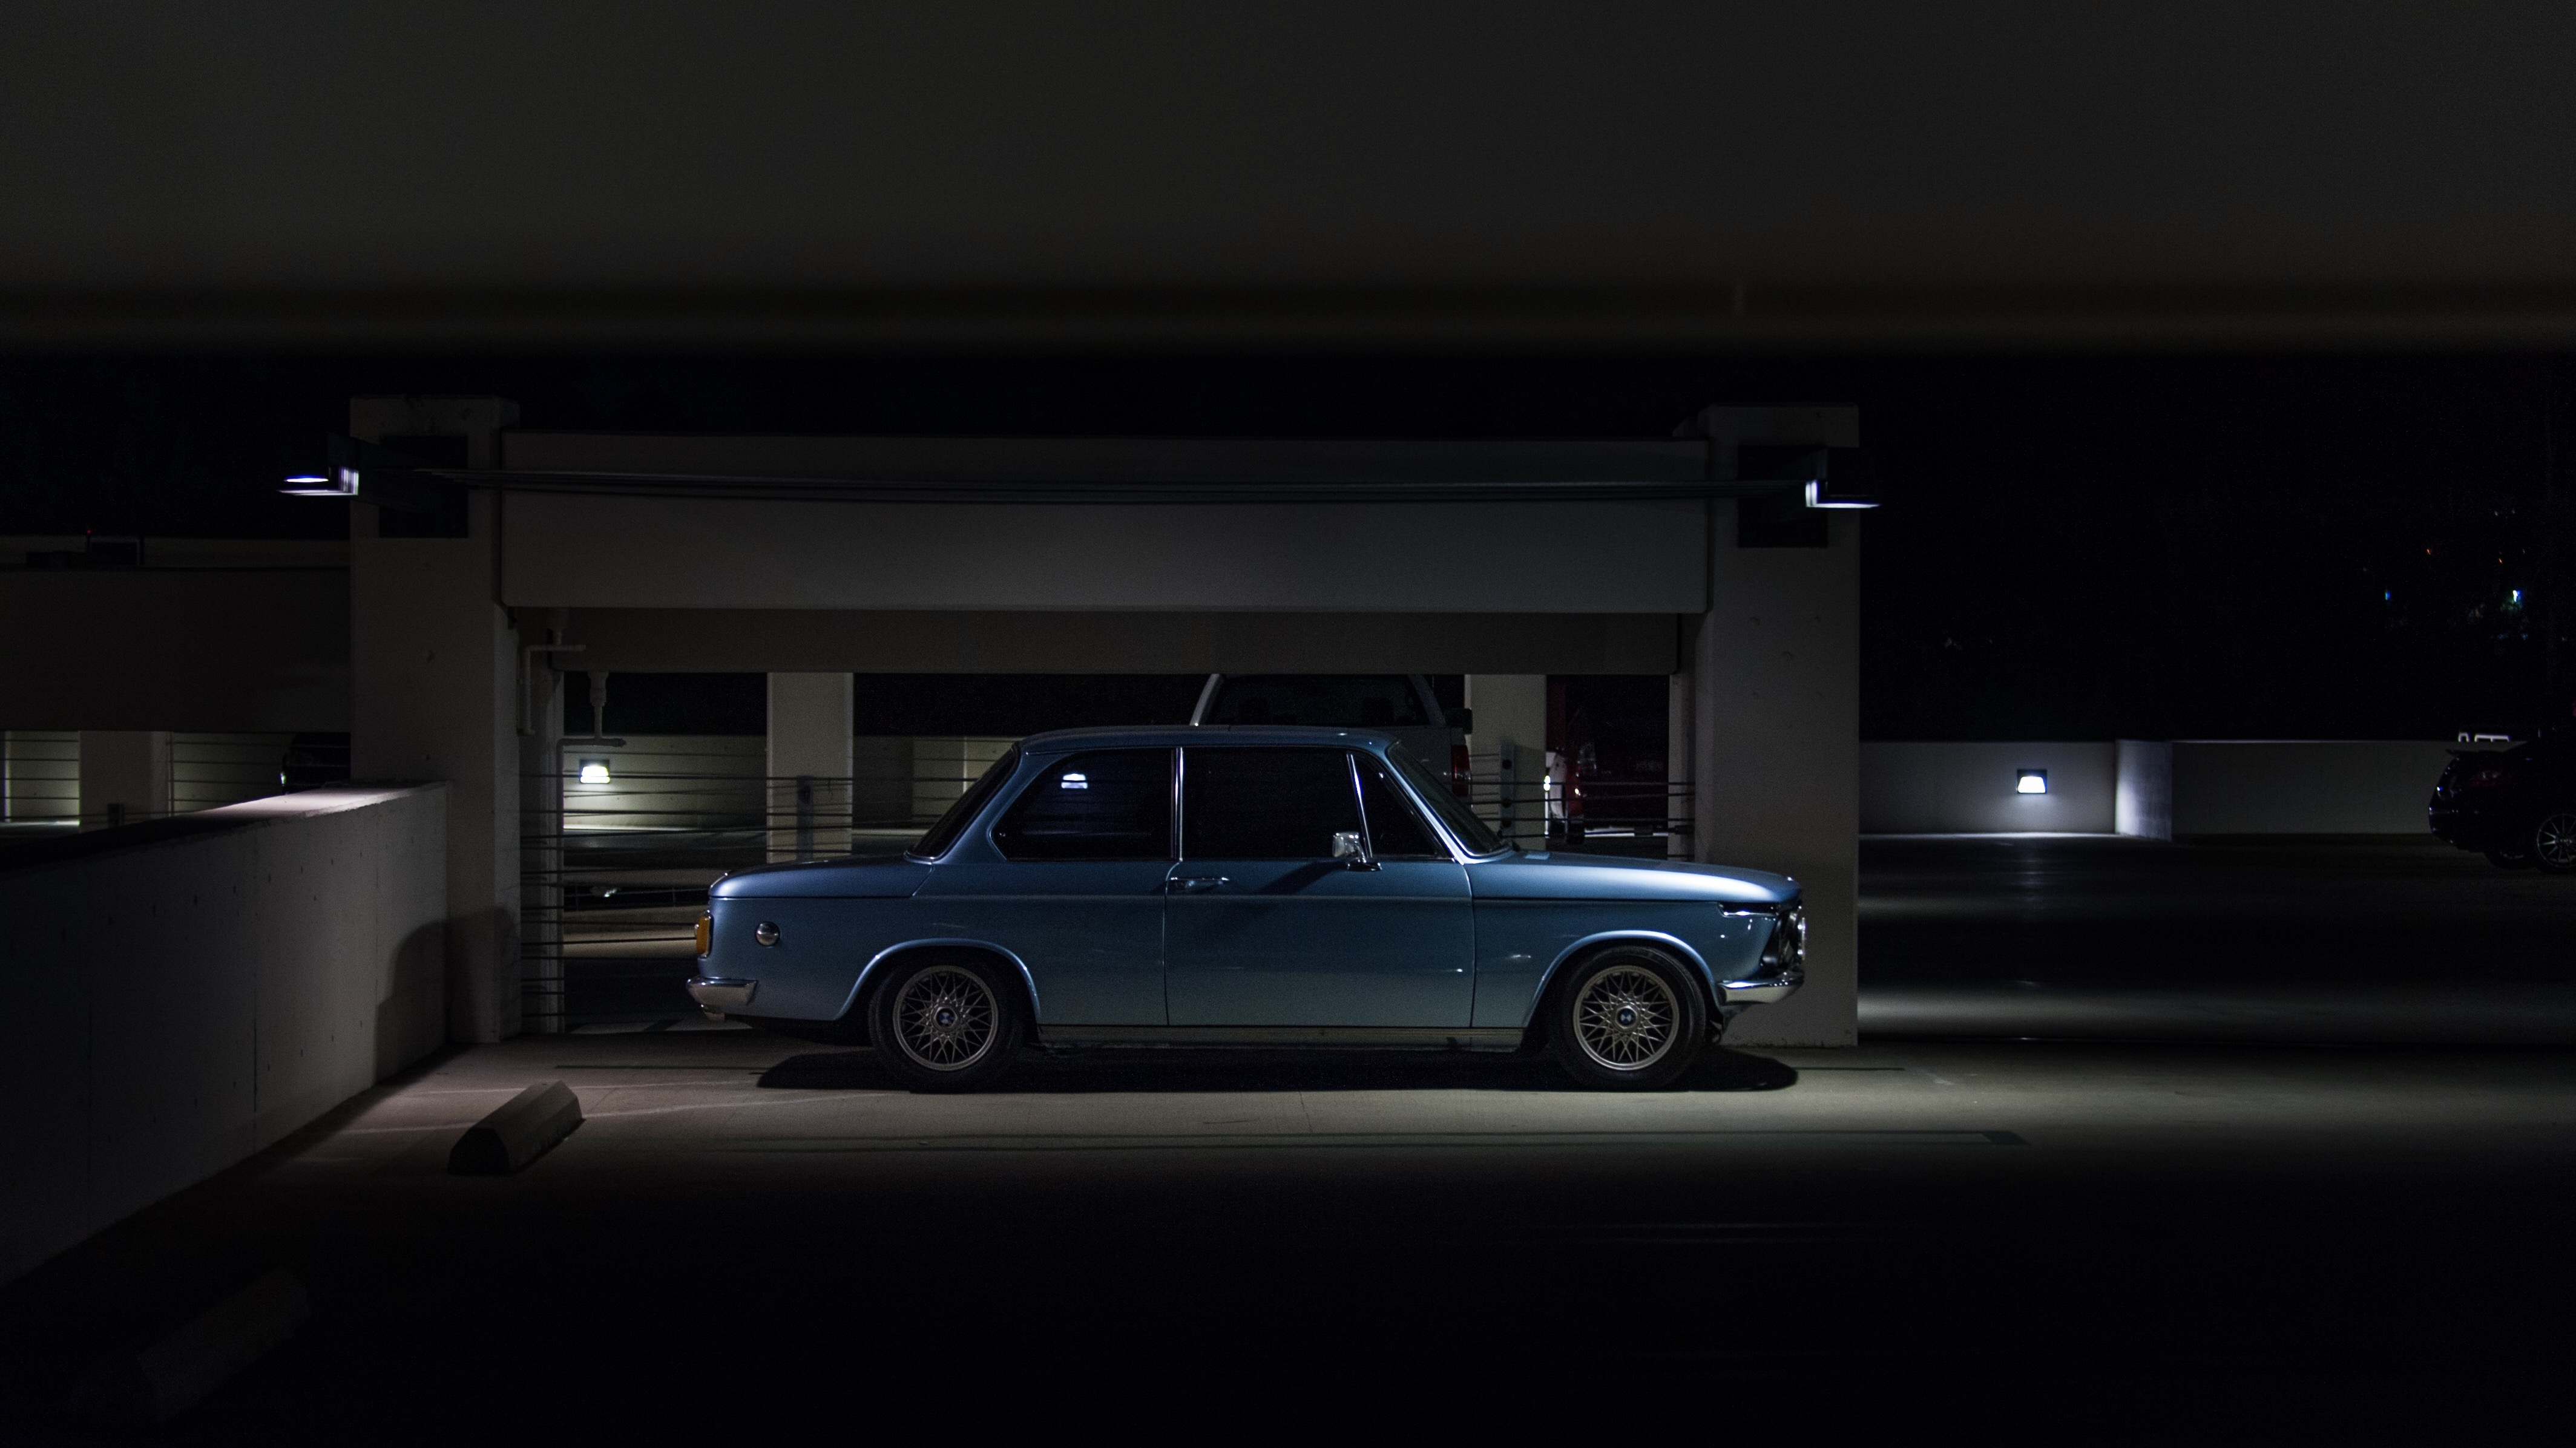 bmw 2002, night, nikon d700, classic, vintage, restoration, bmw, 2002, bmw e10, bbs